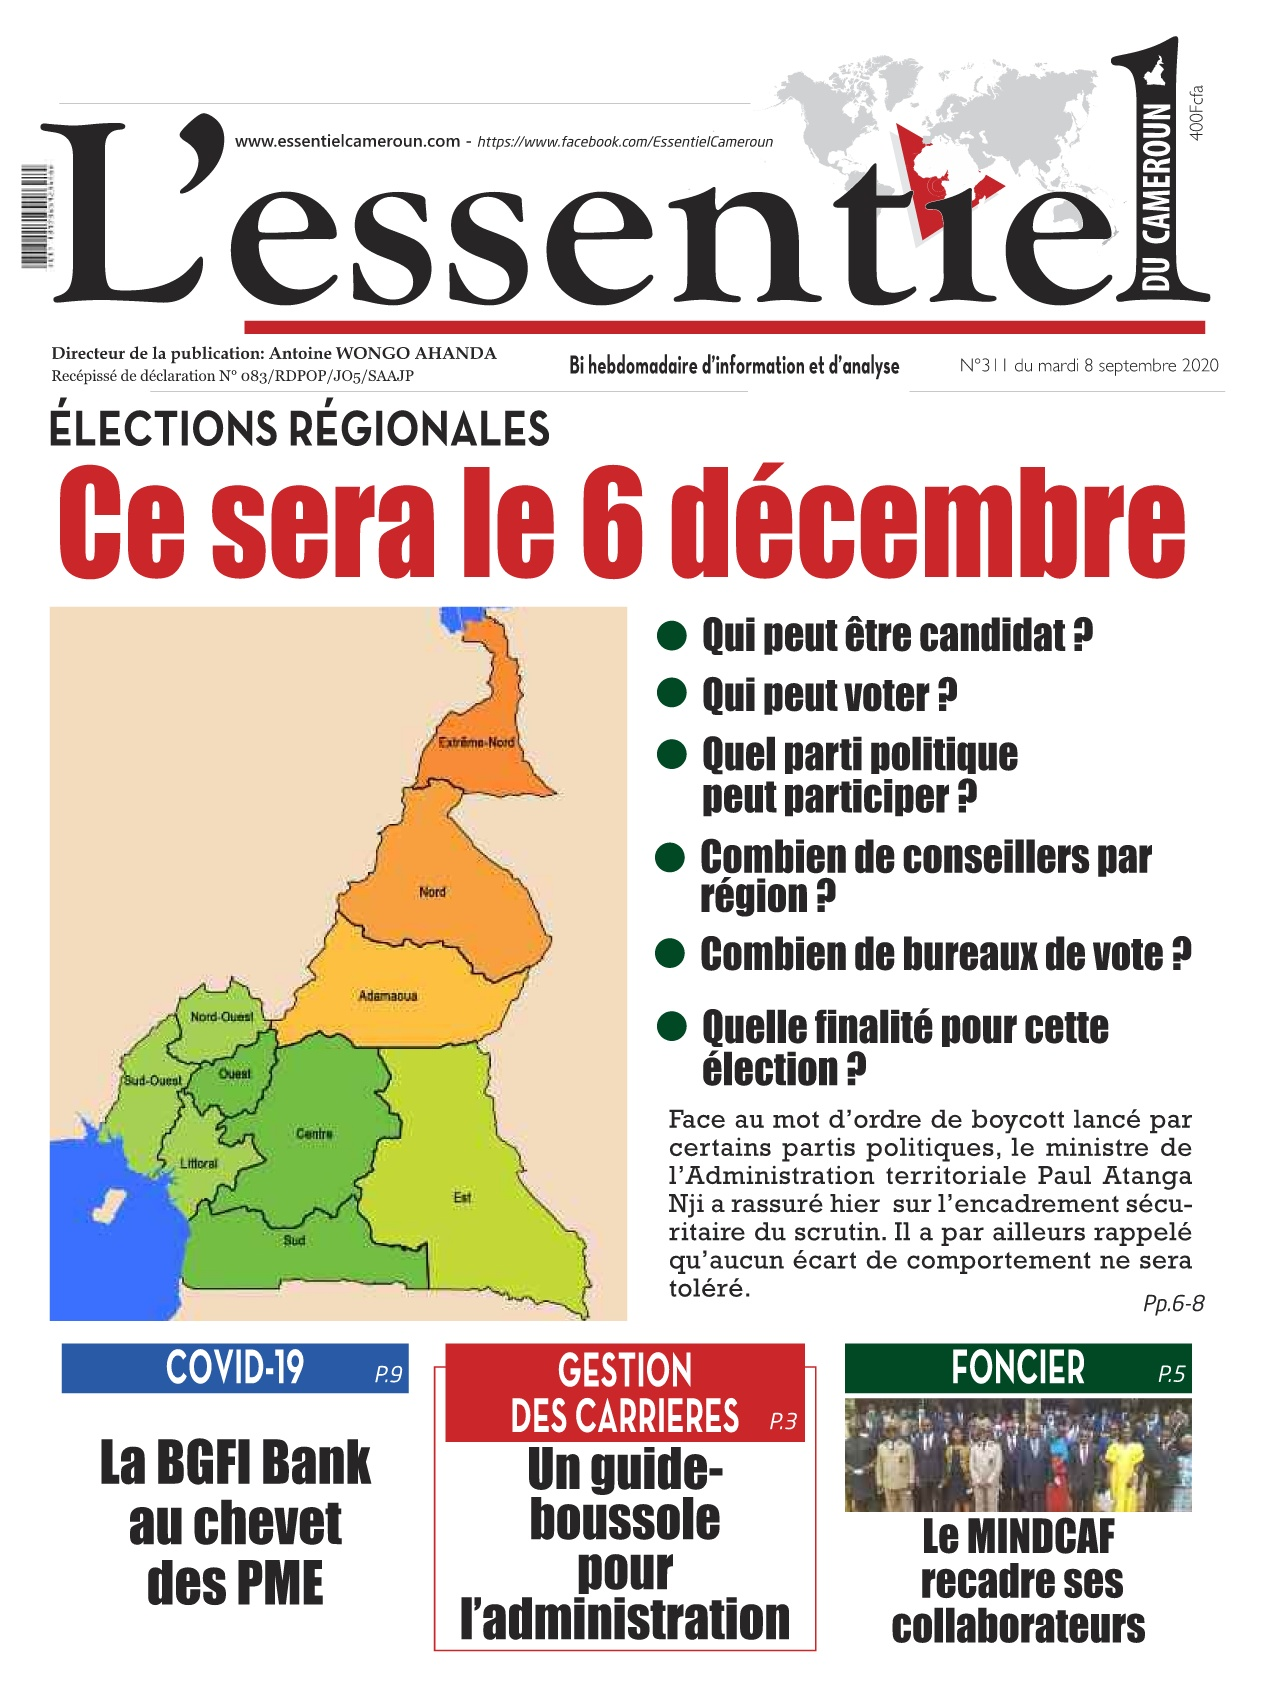 L'essentiel du Cameroun - 08/09/2020